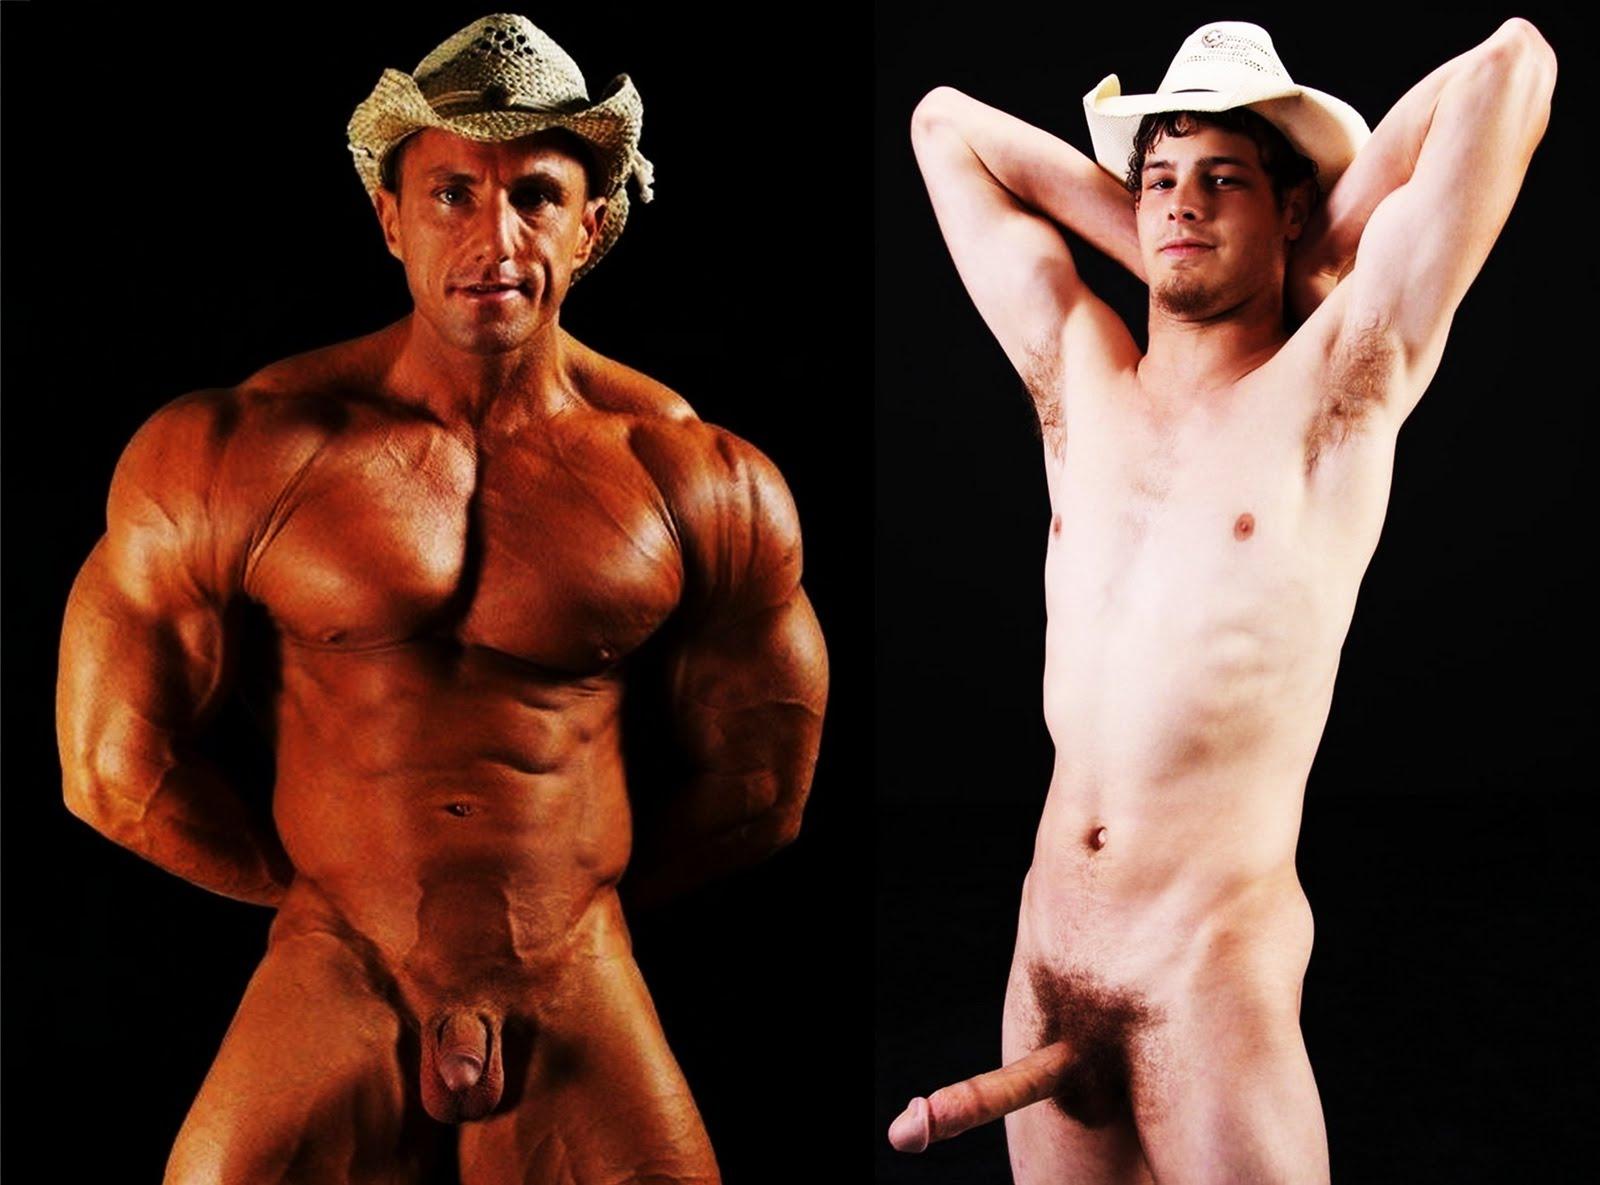 http://2.bp.blogspot.com/-pHSdOZ014d4/Tw31ewd-_PI/AAAAAAAAMKg/xeu6XqzXt_Y/s1600/Big+cowboy+and+small+cowboy.jpg